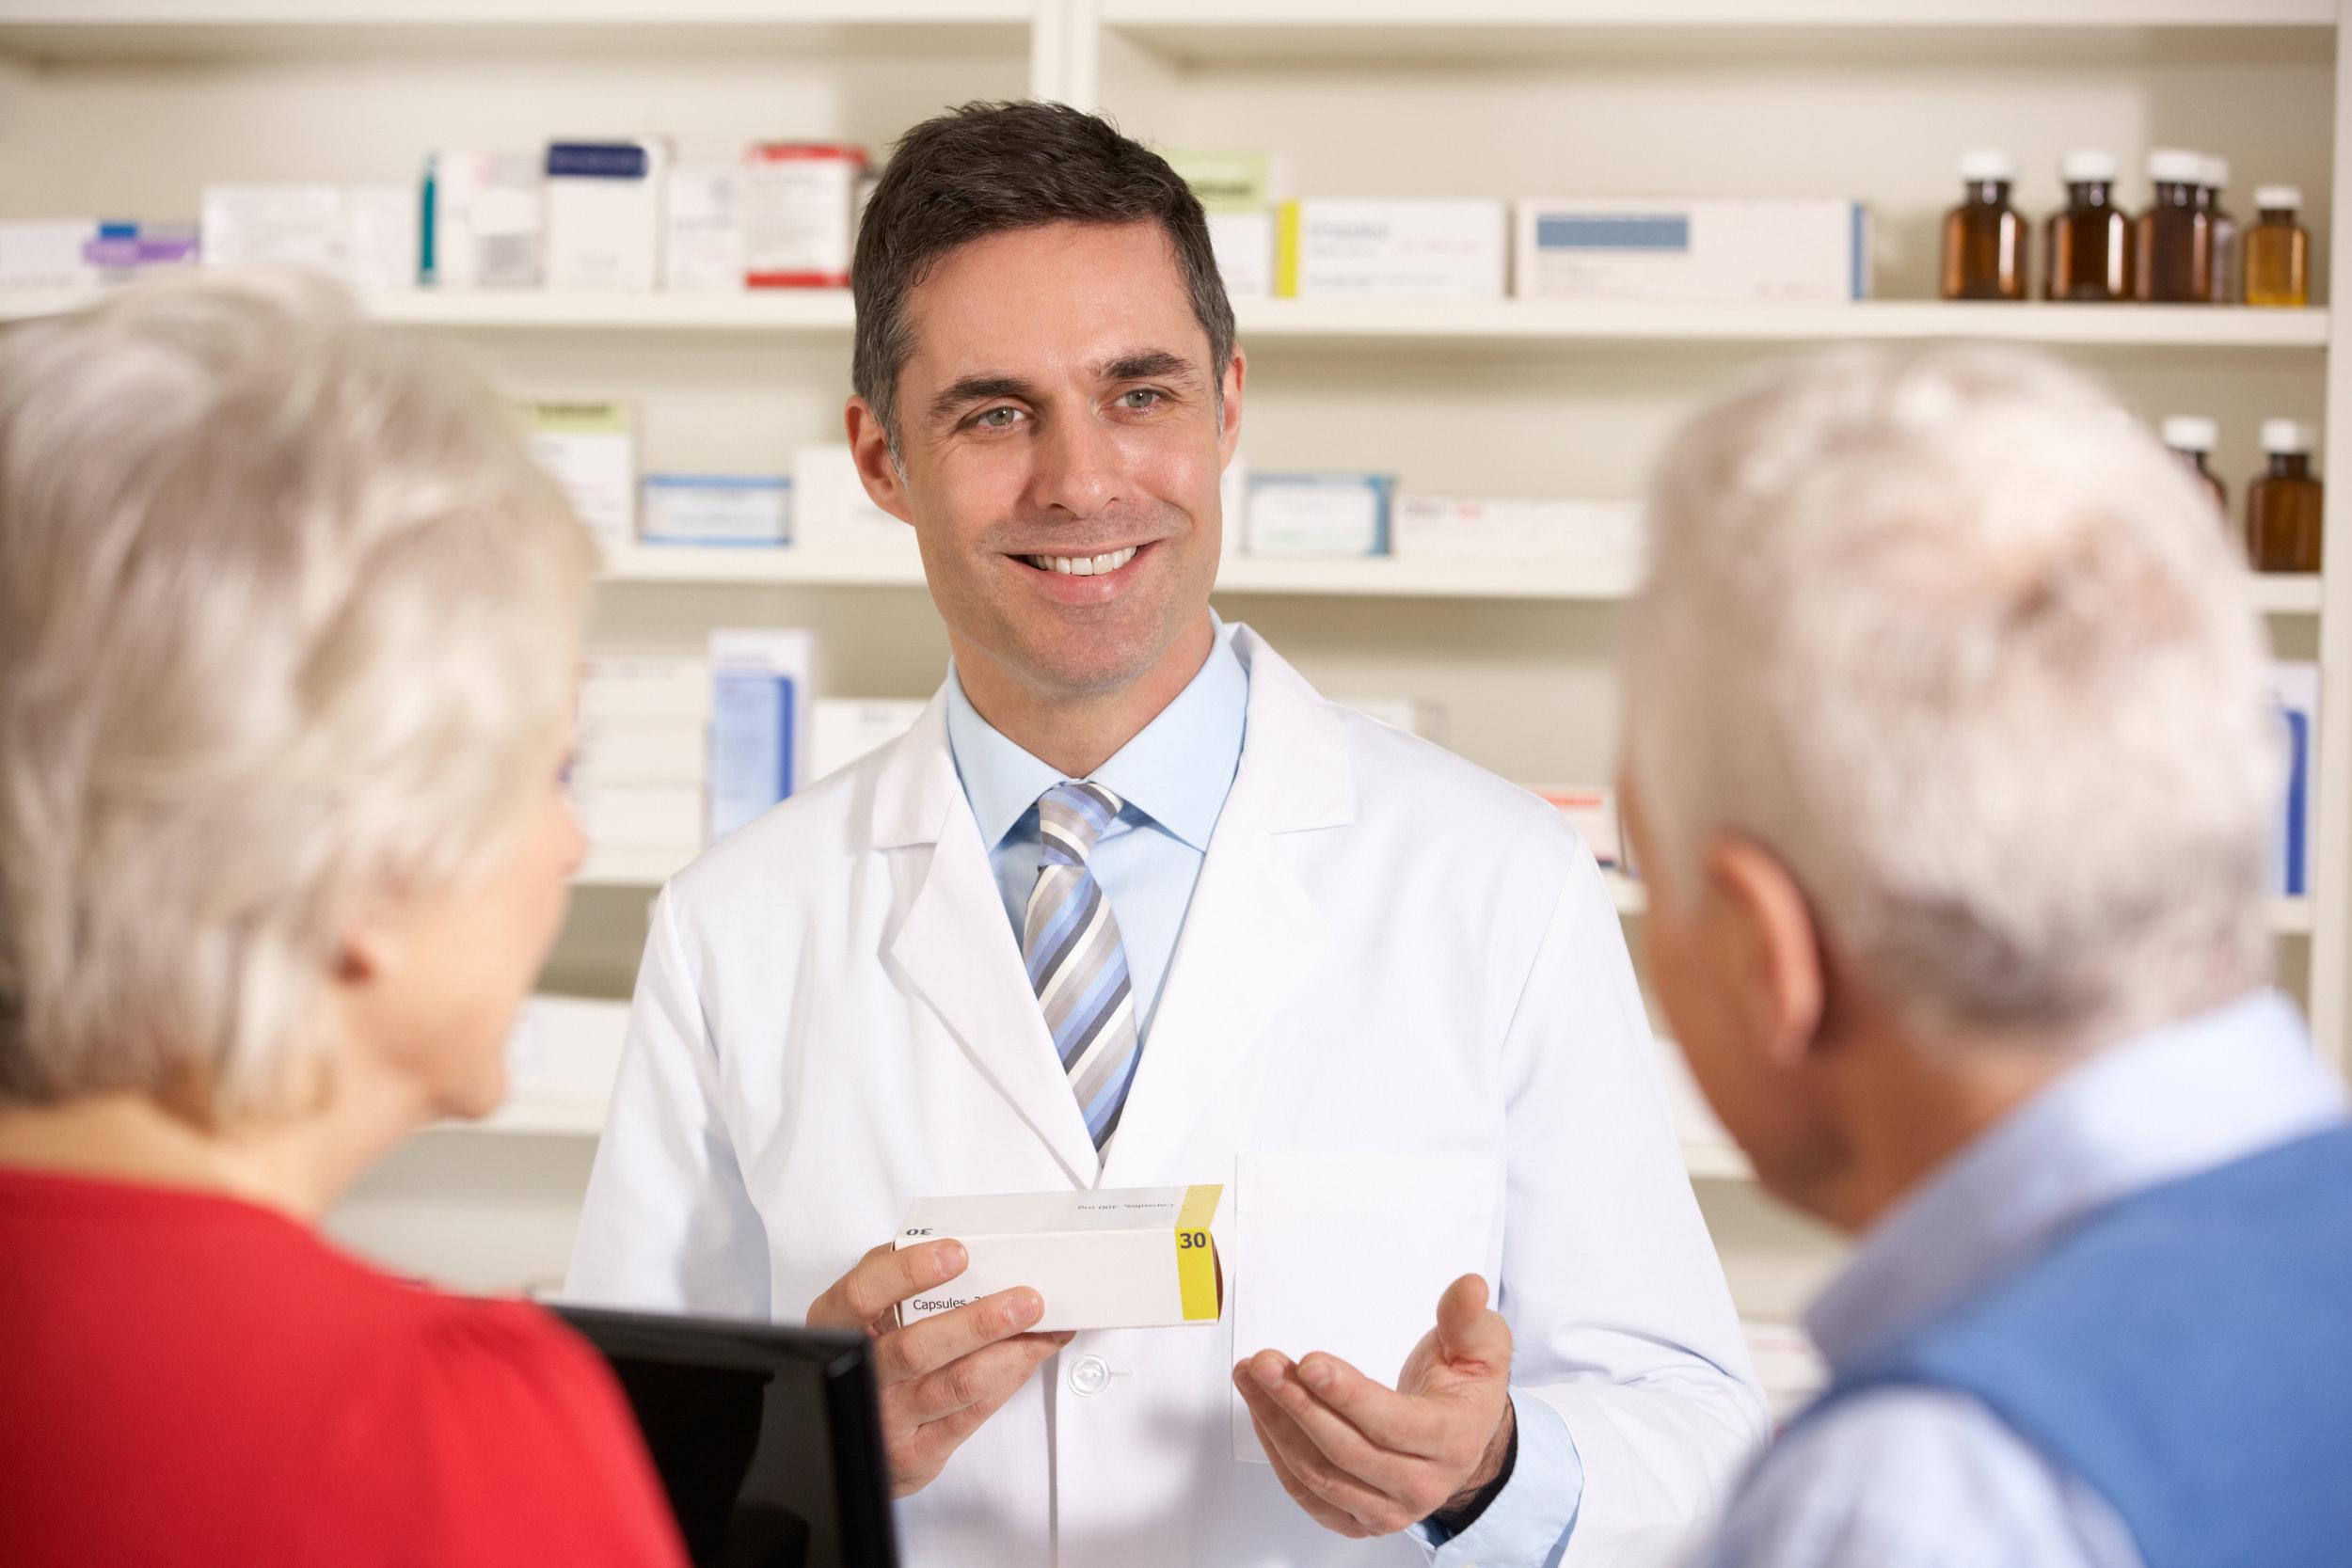 American pharmacist with senior couple in pharmacy dreamstime_xxl_23958449.jpg